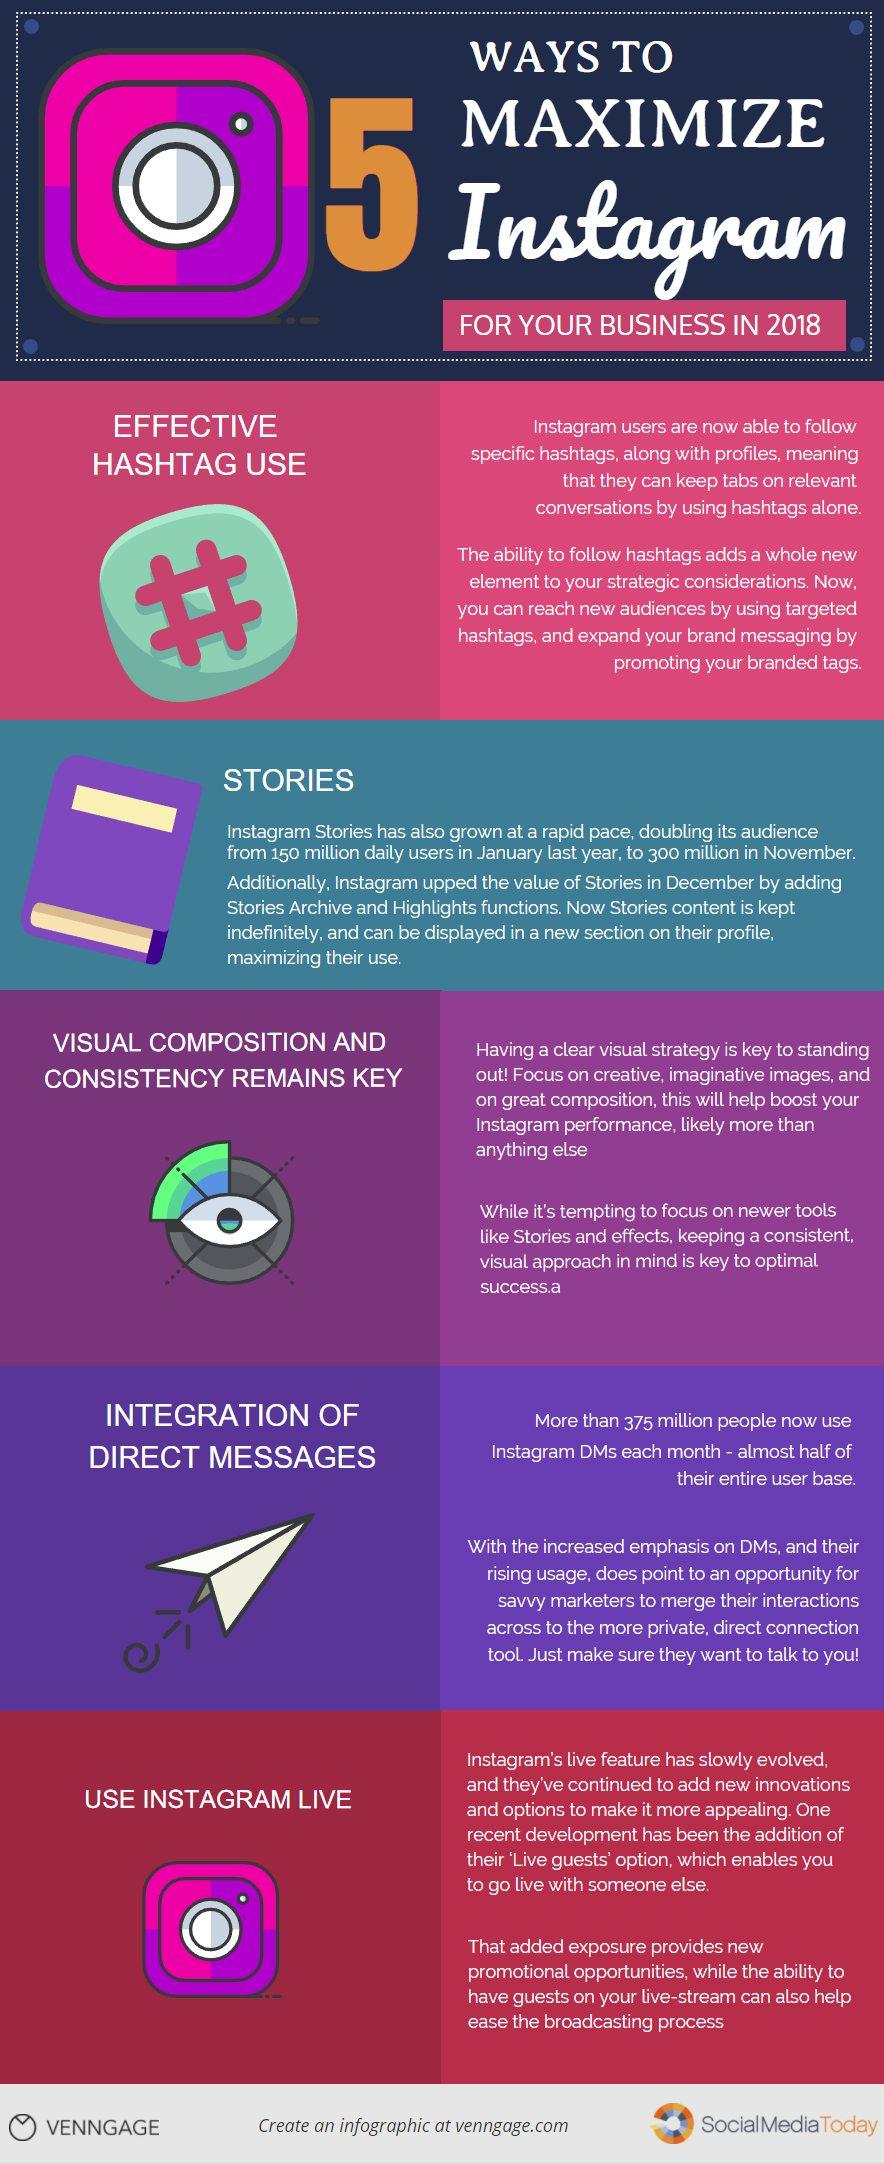 Ways to Maximise Instagram